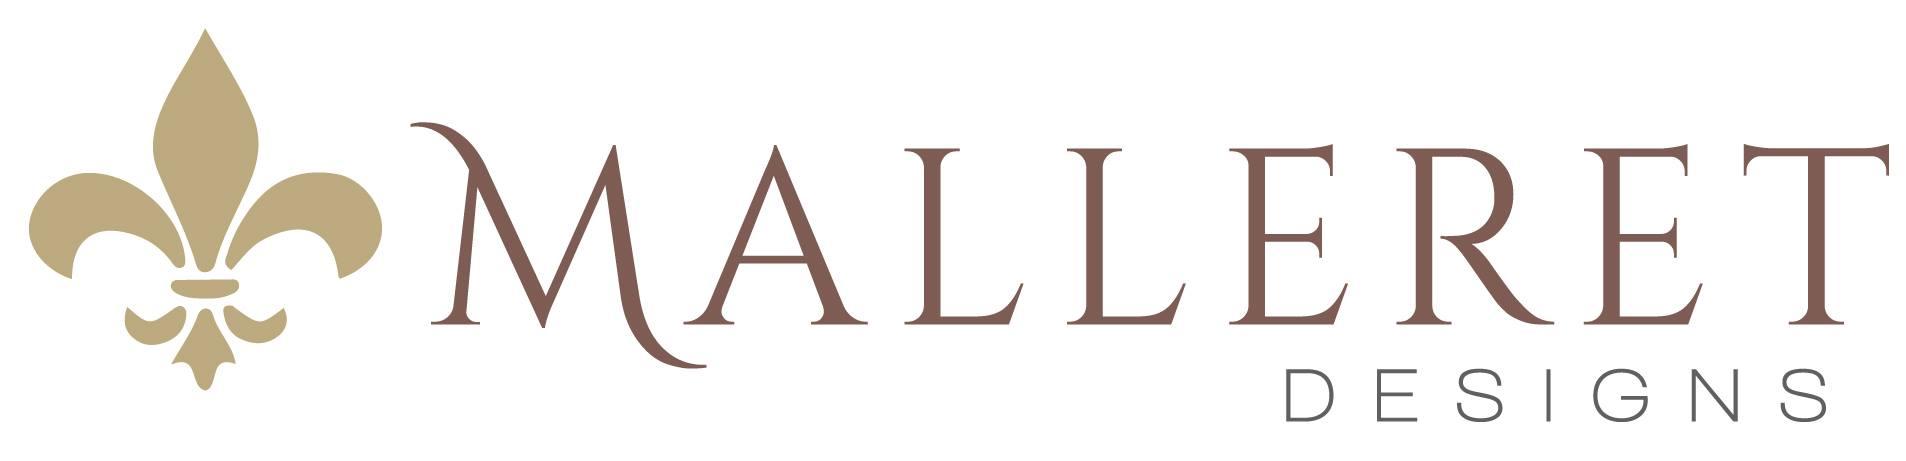 Malleret Designs Floral, Wedding Planner